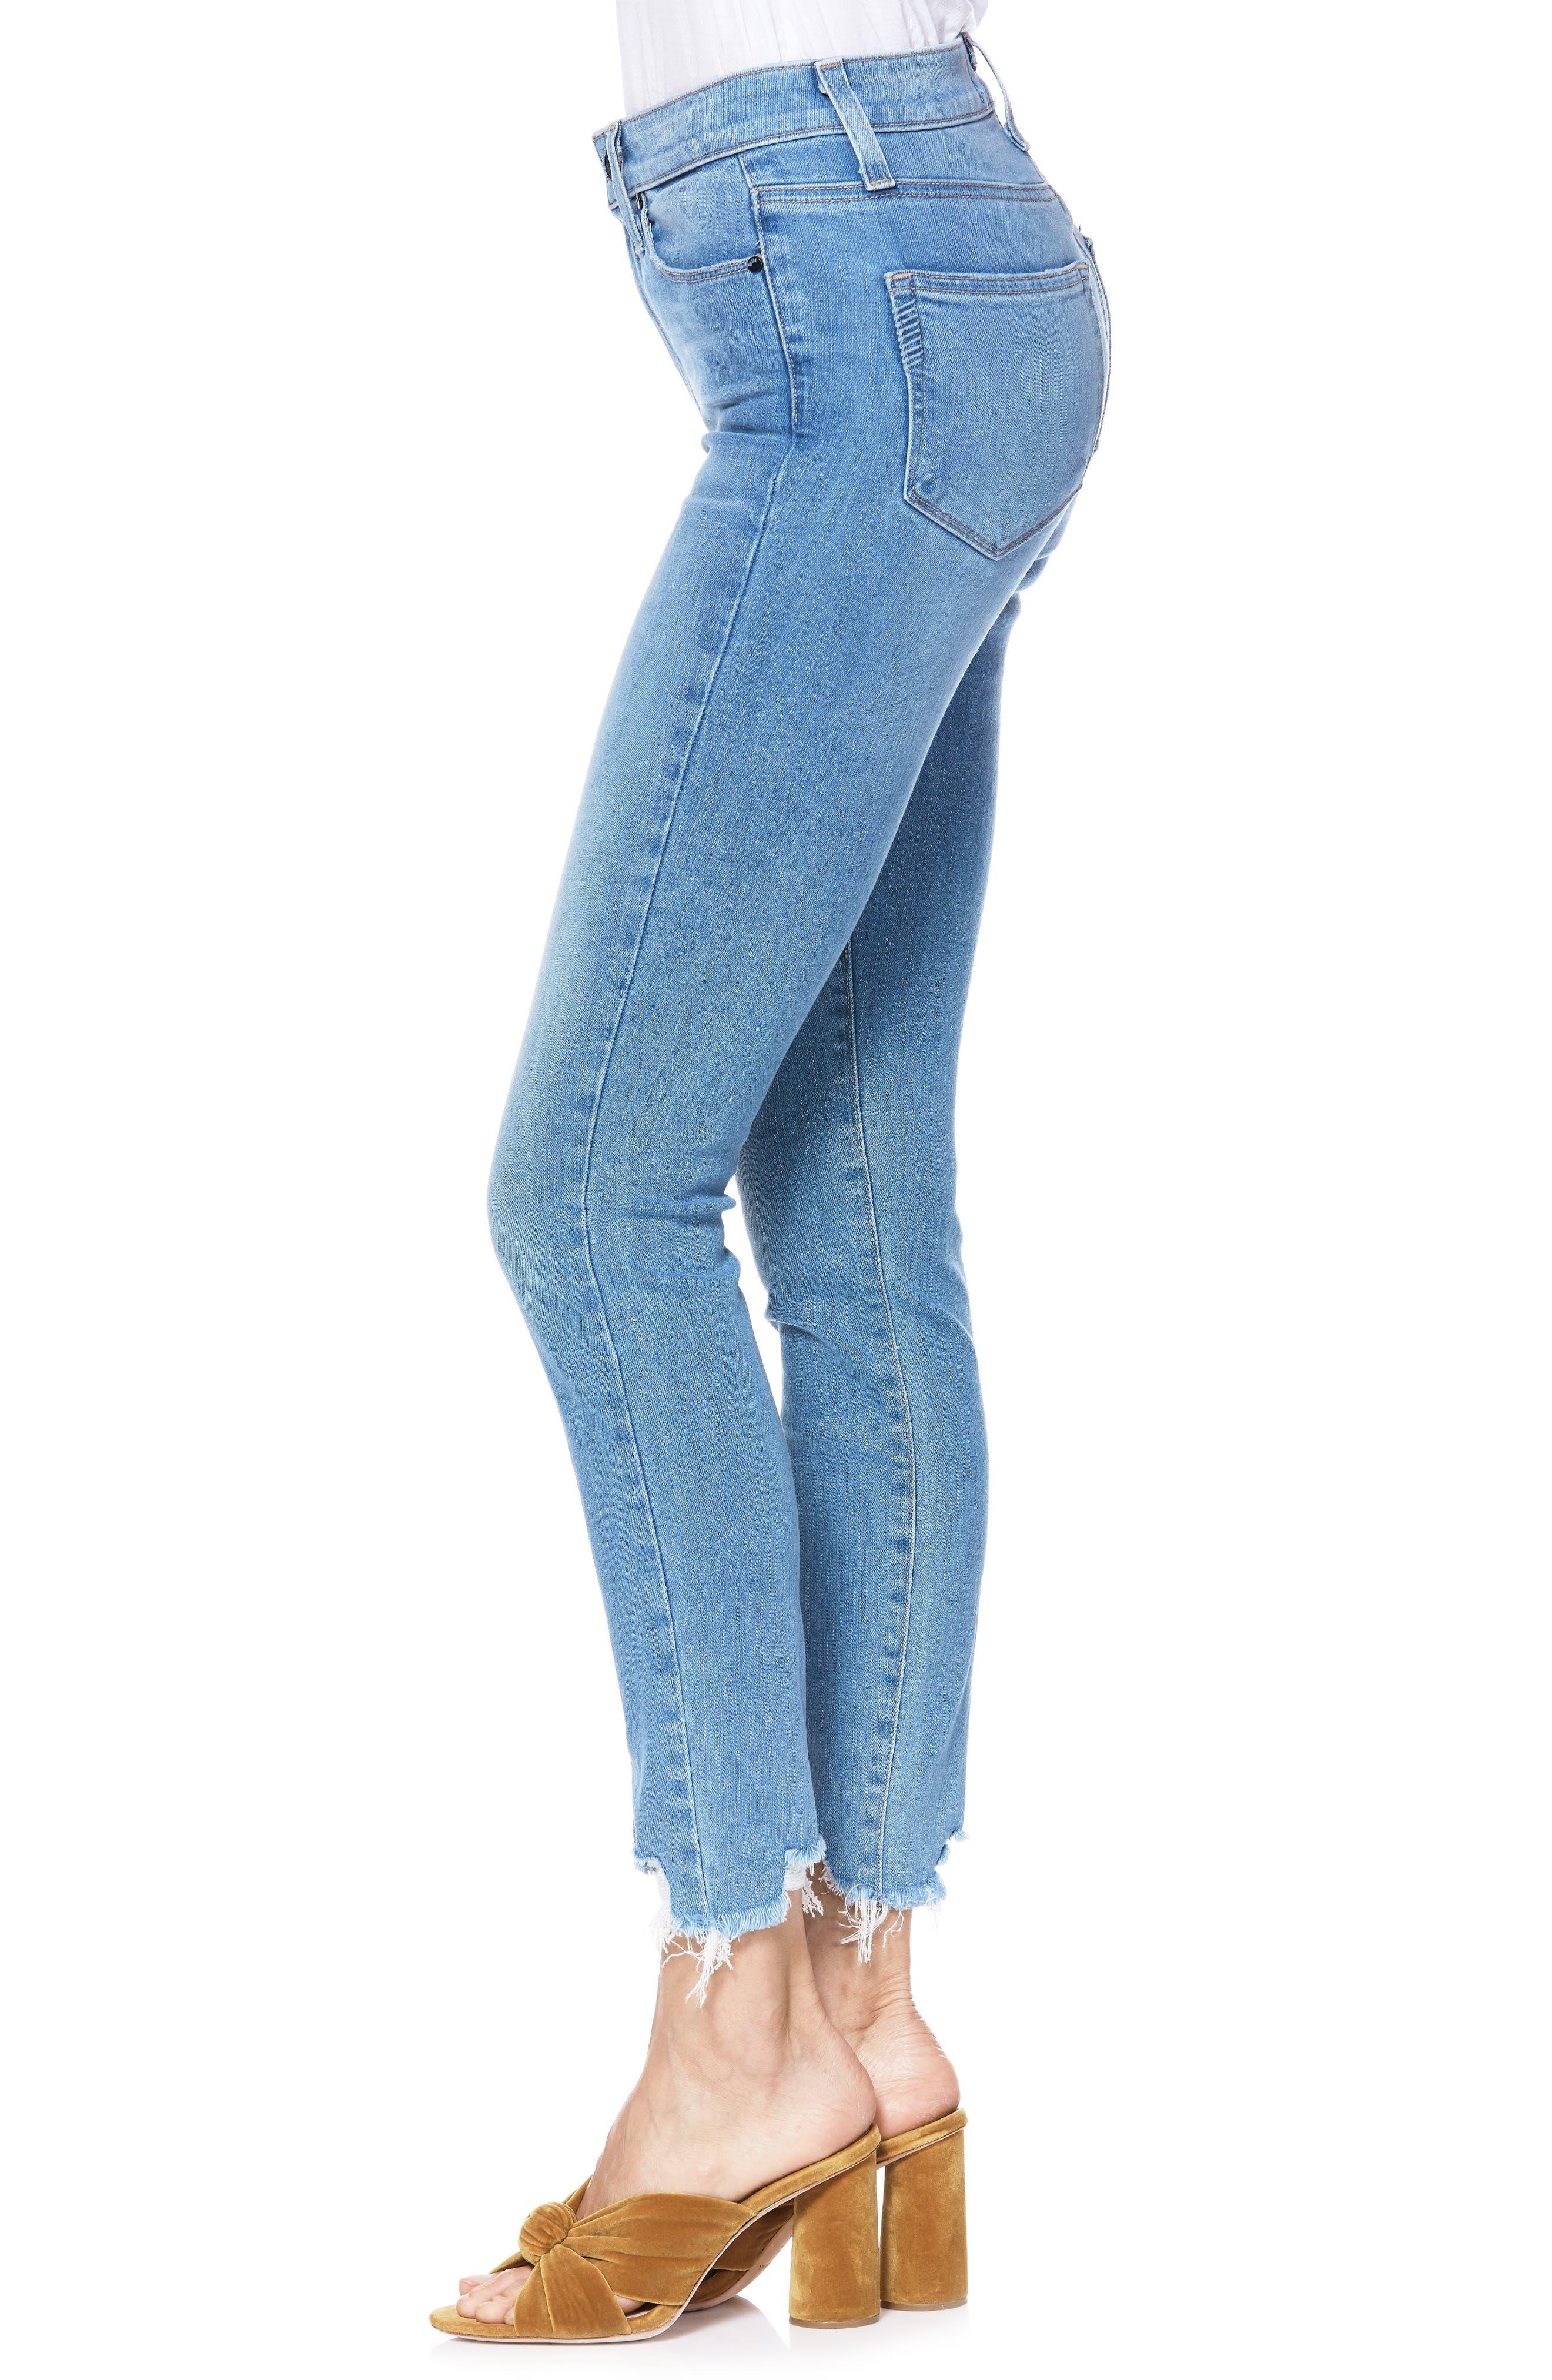 Transcend Vintage - Hoxton High Waist Ripped Crop Skinny Jeans,                             Alternate thumbnail 3, color,                             ALAMEDA